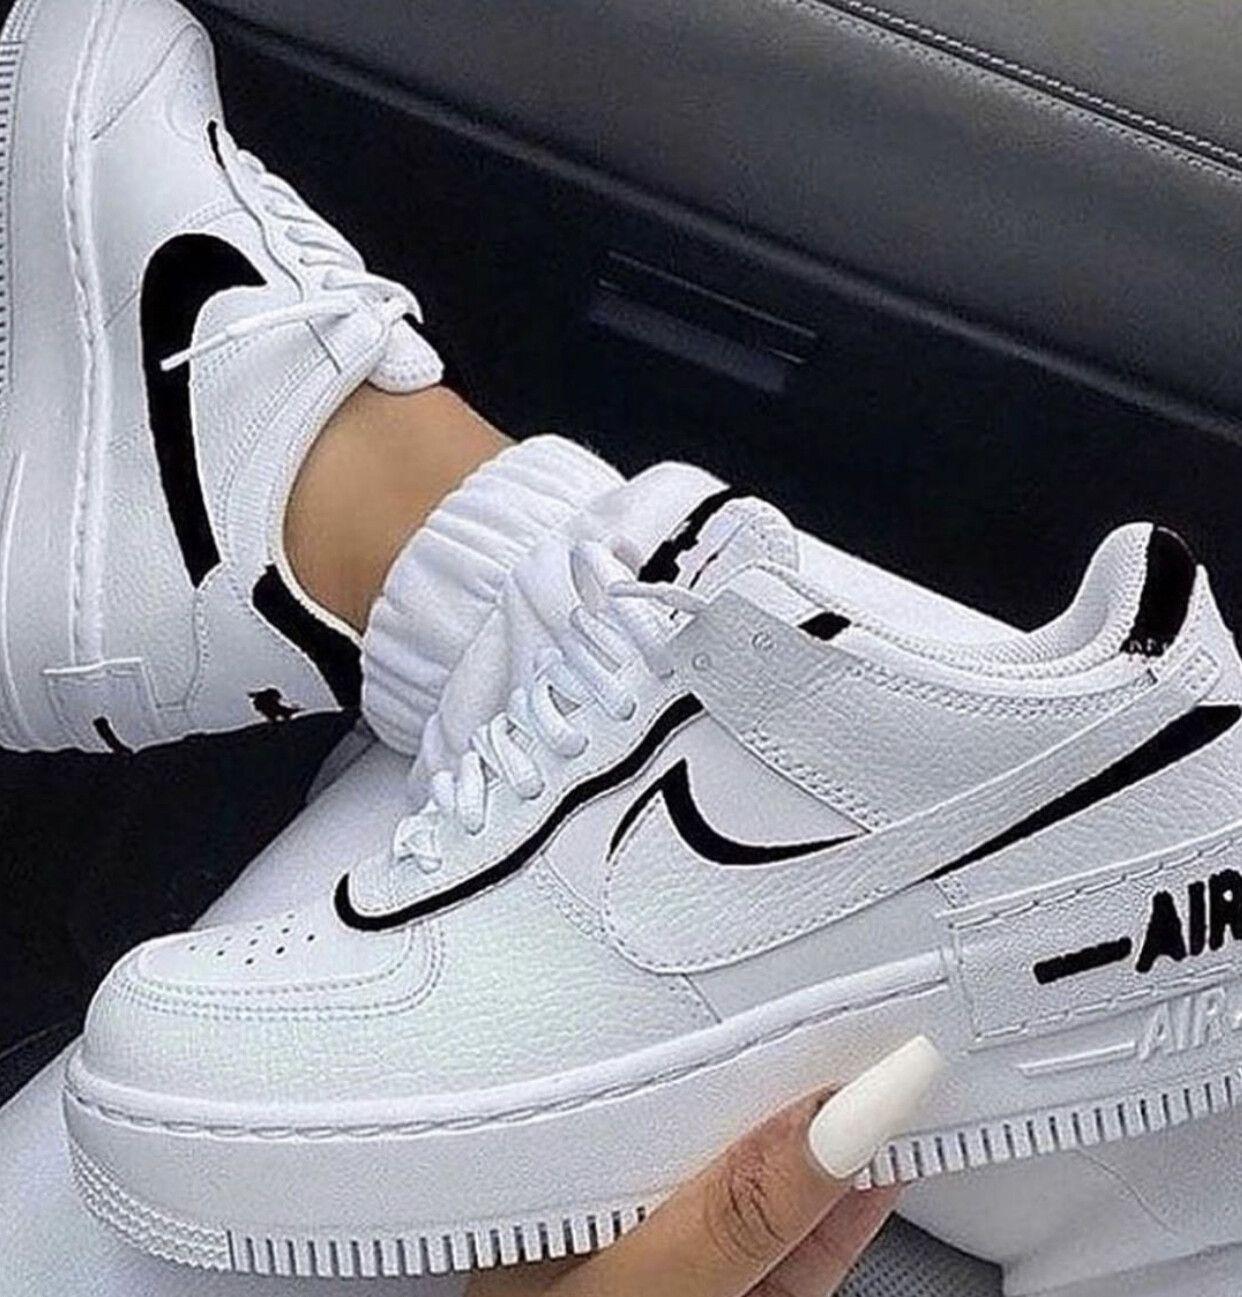 air force 1 nike negras